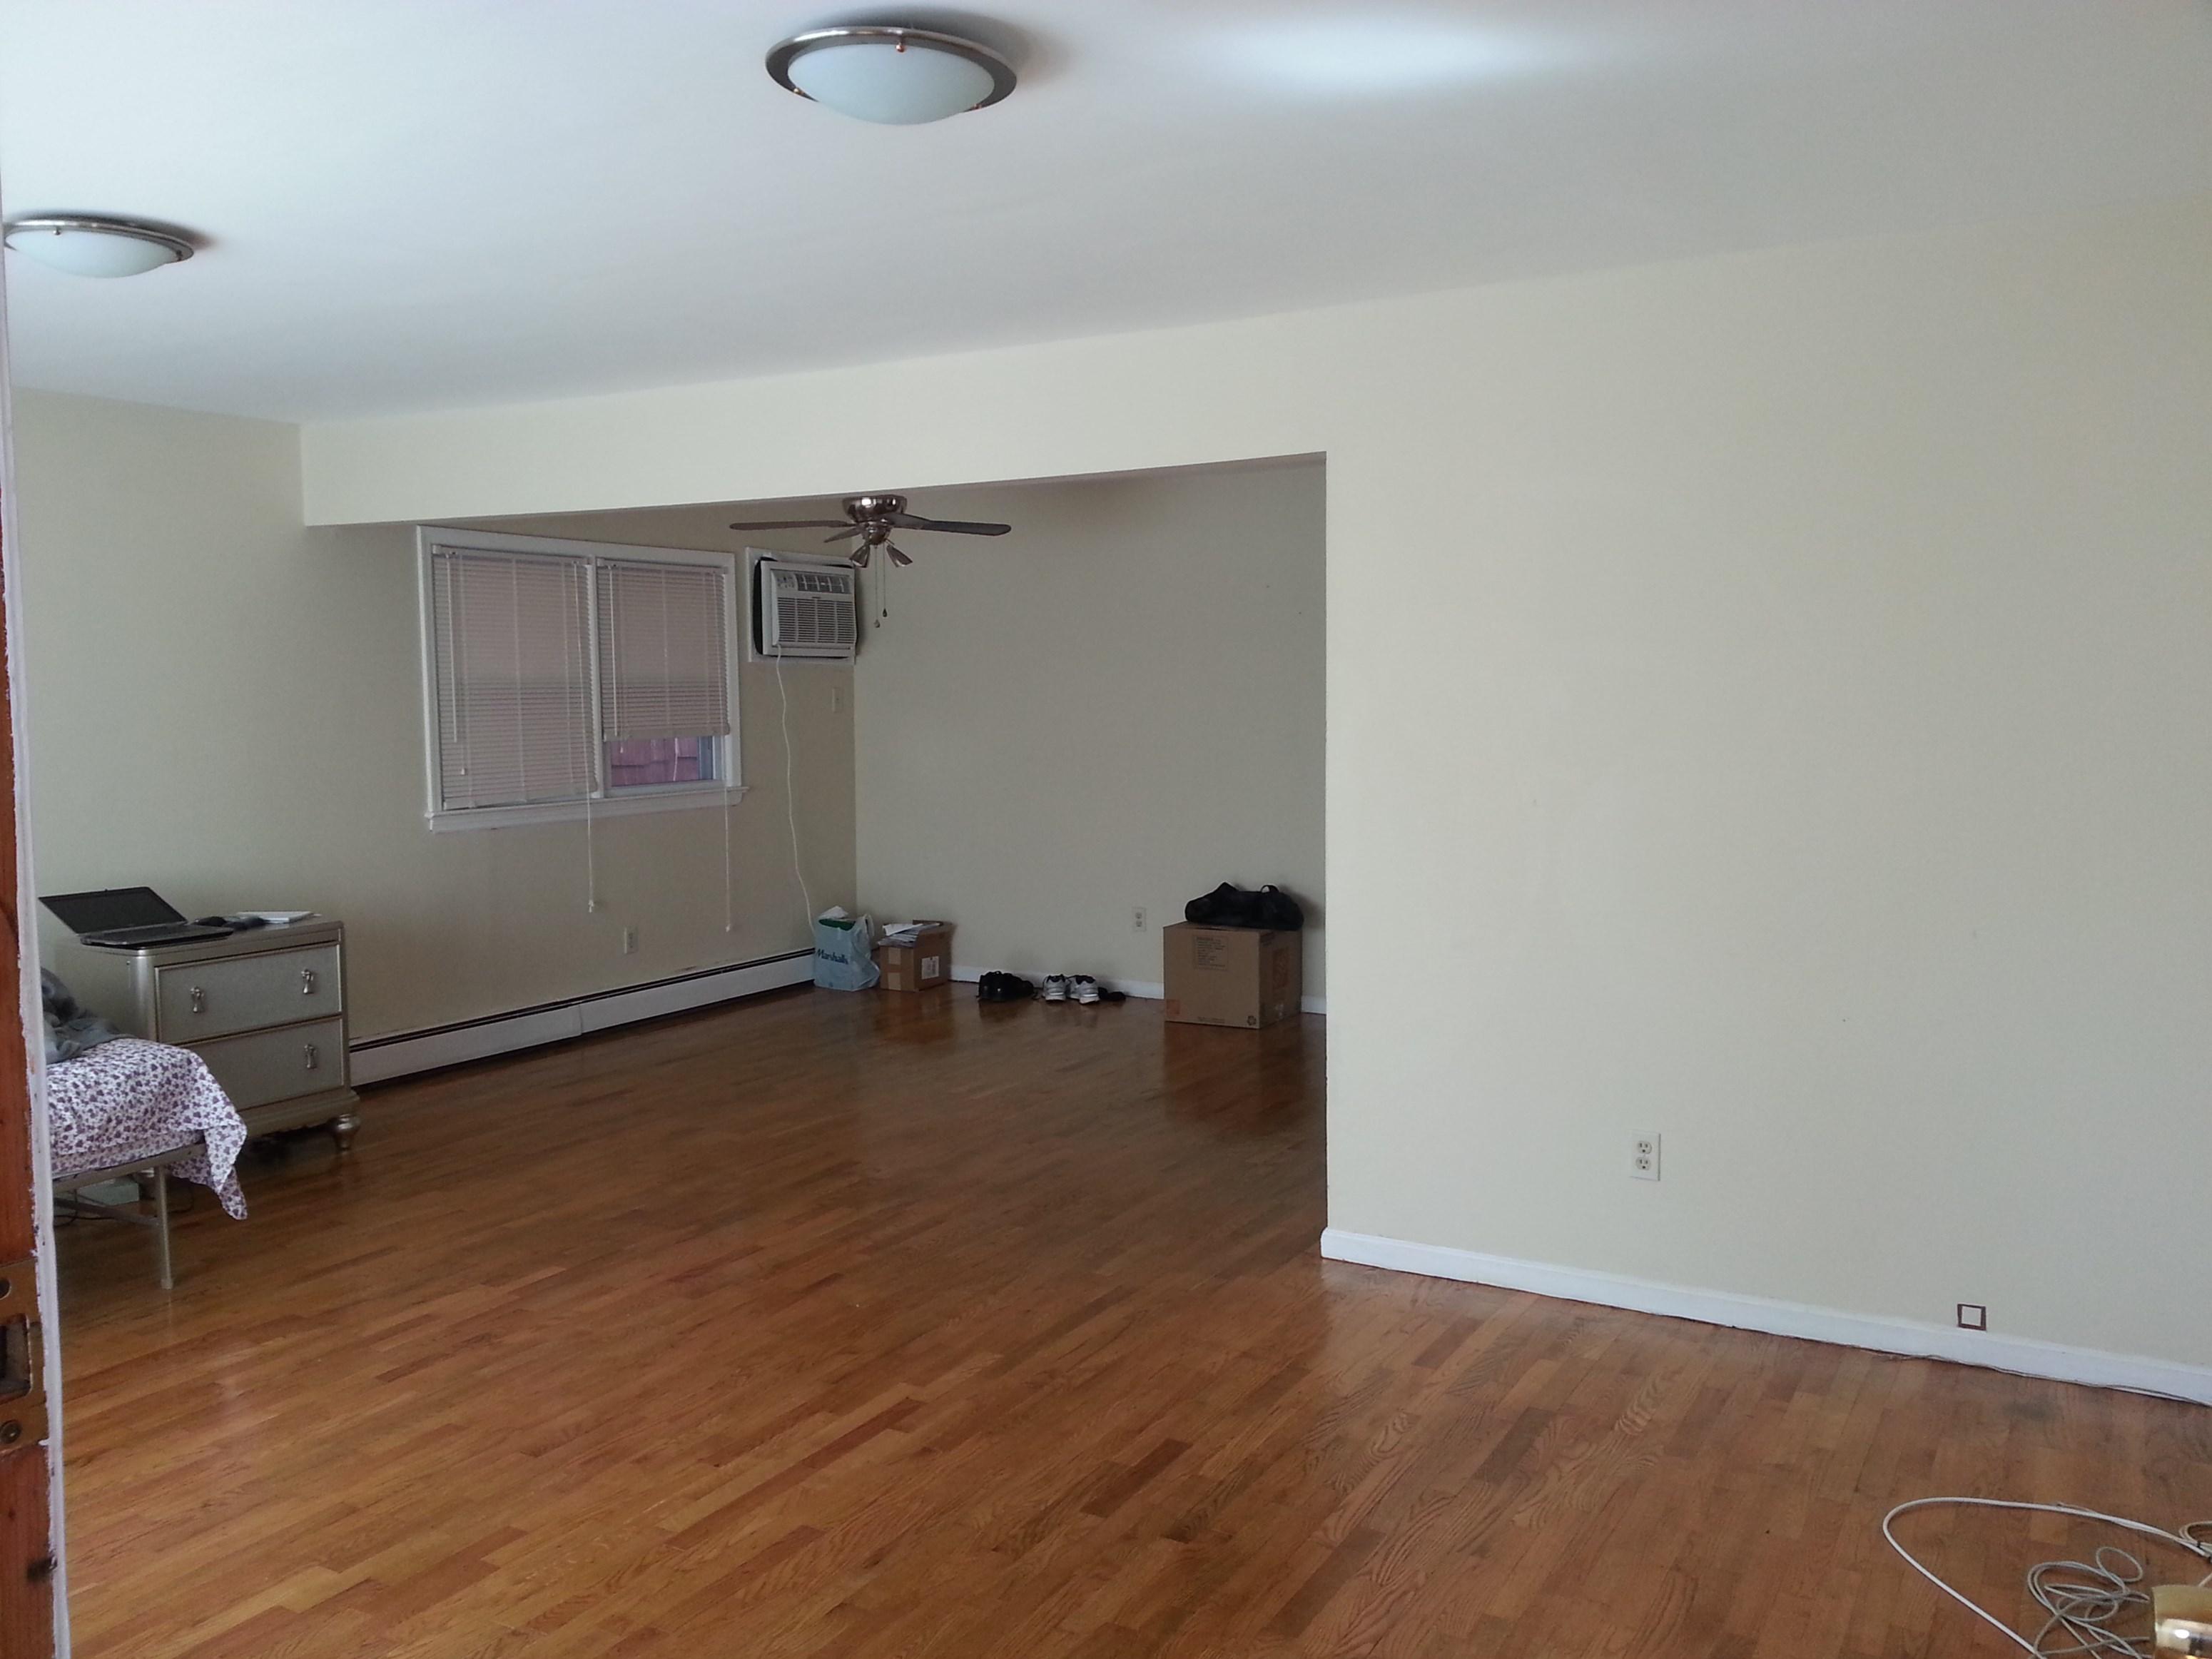 2 Bedroom Apt In Bayonne Nj home decor Xshare